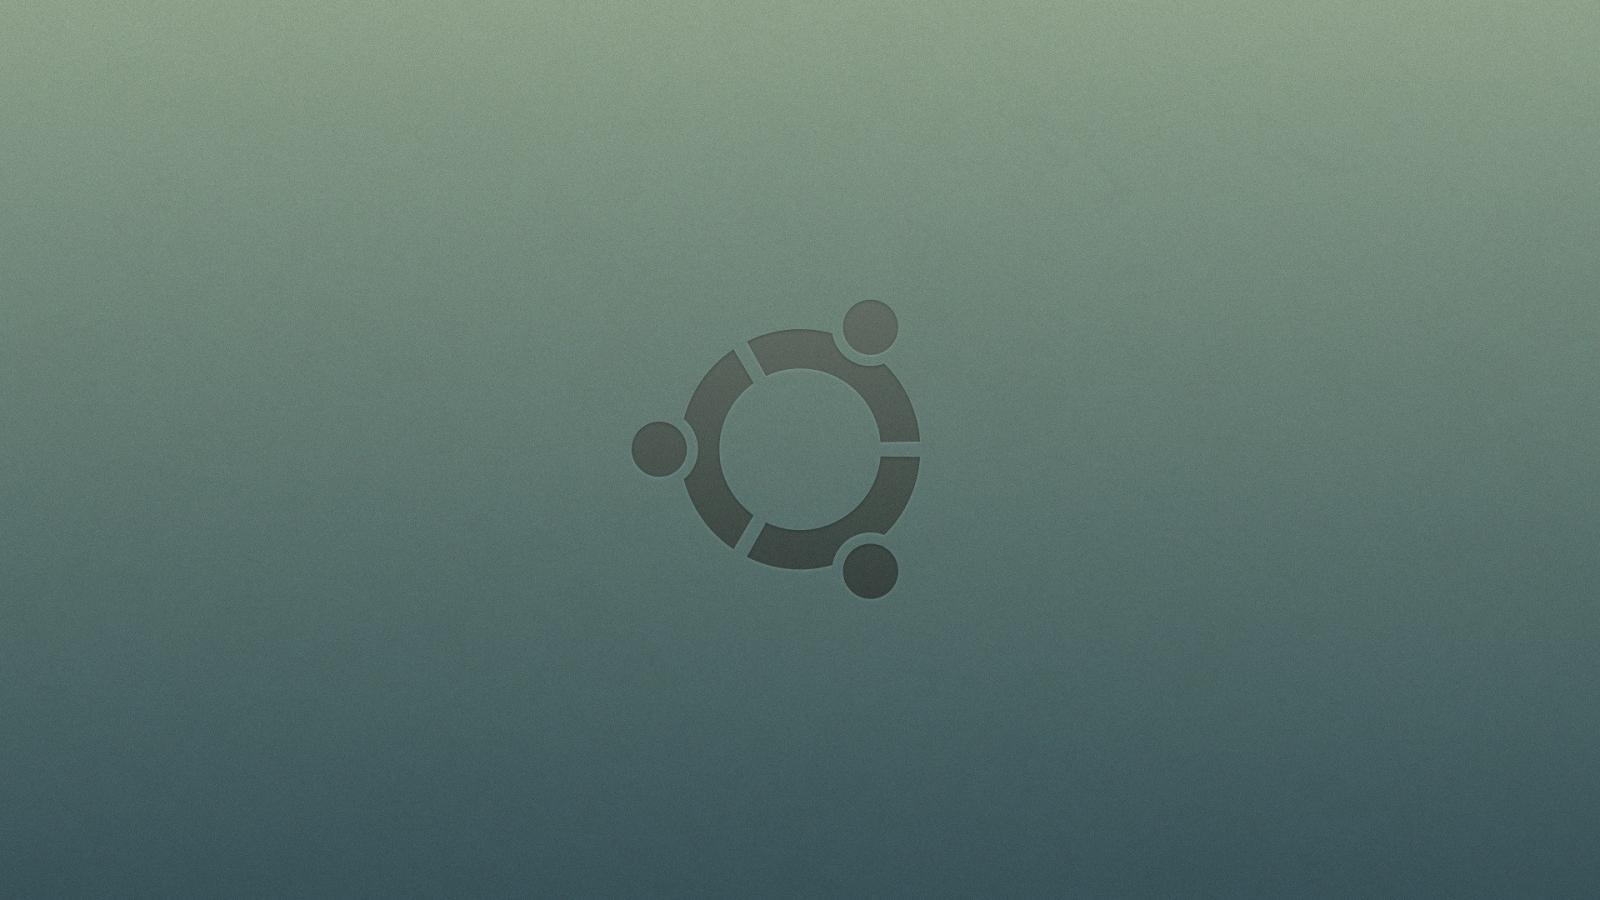 Ubuntu logo - 1600x900